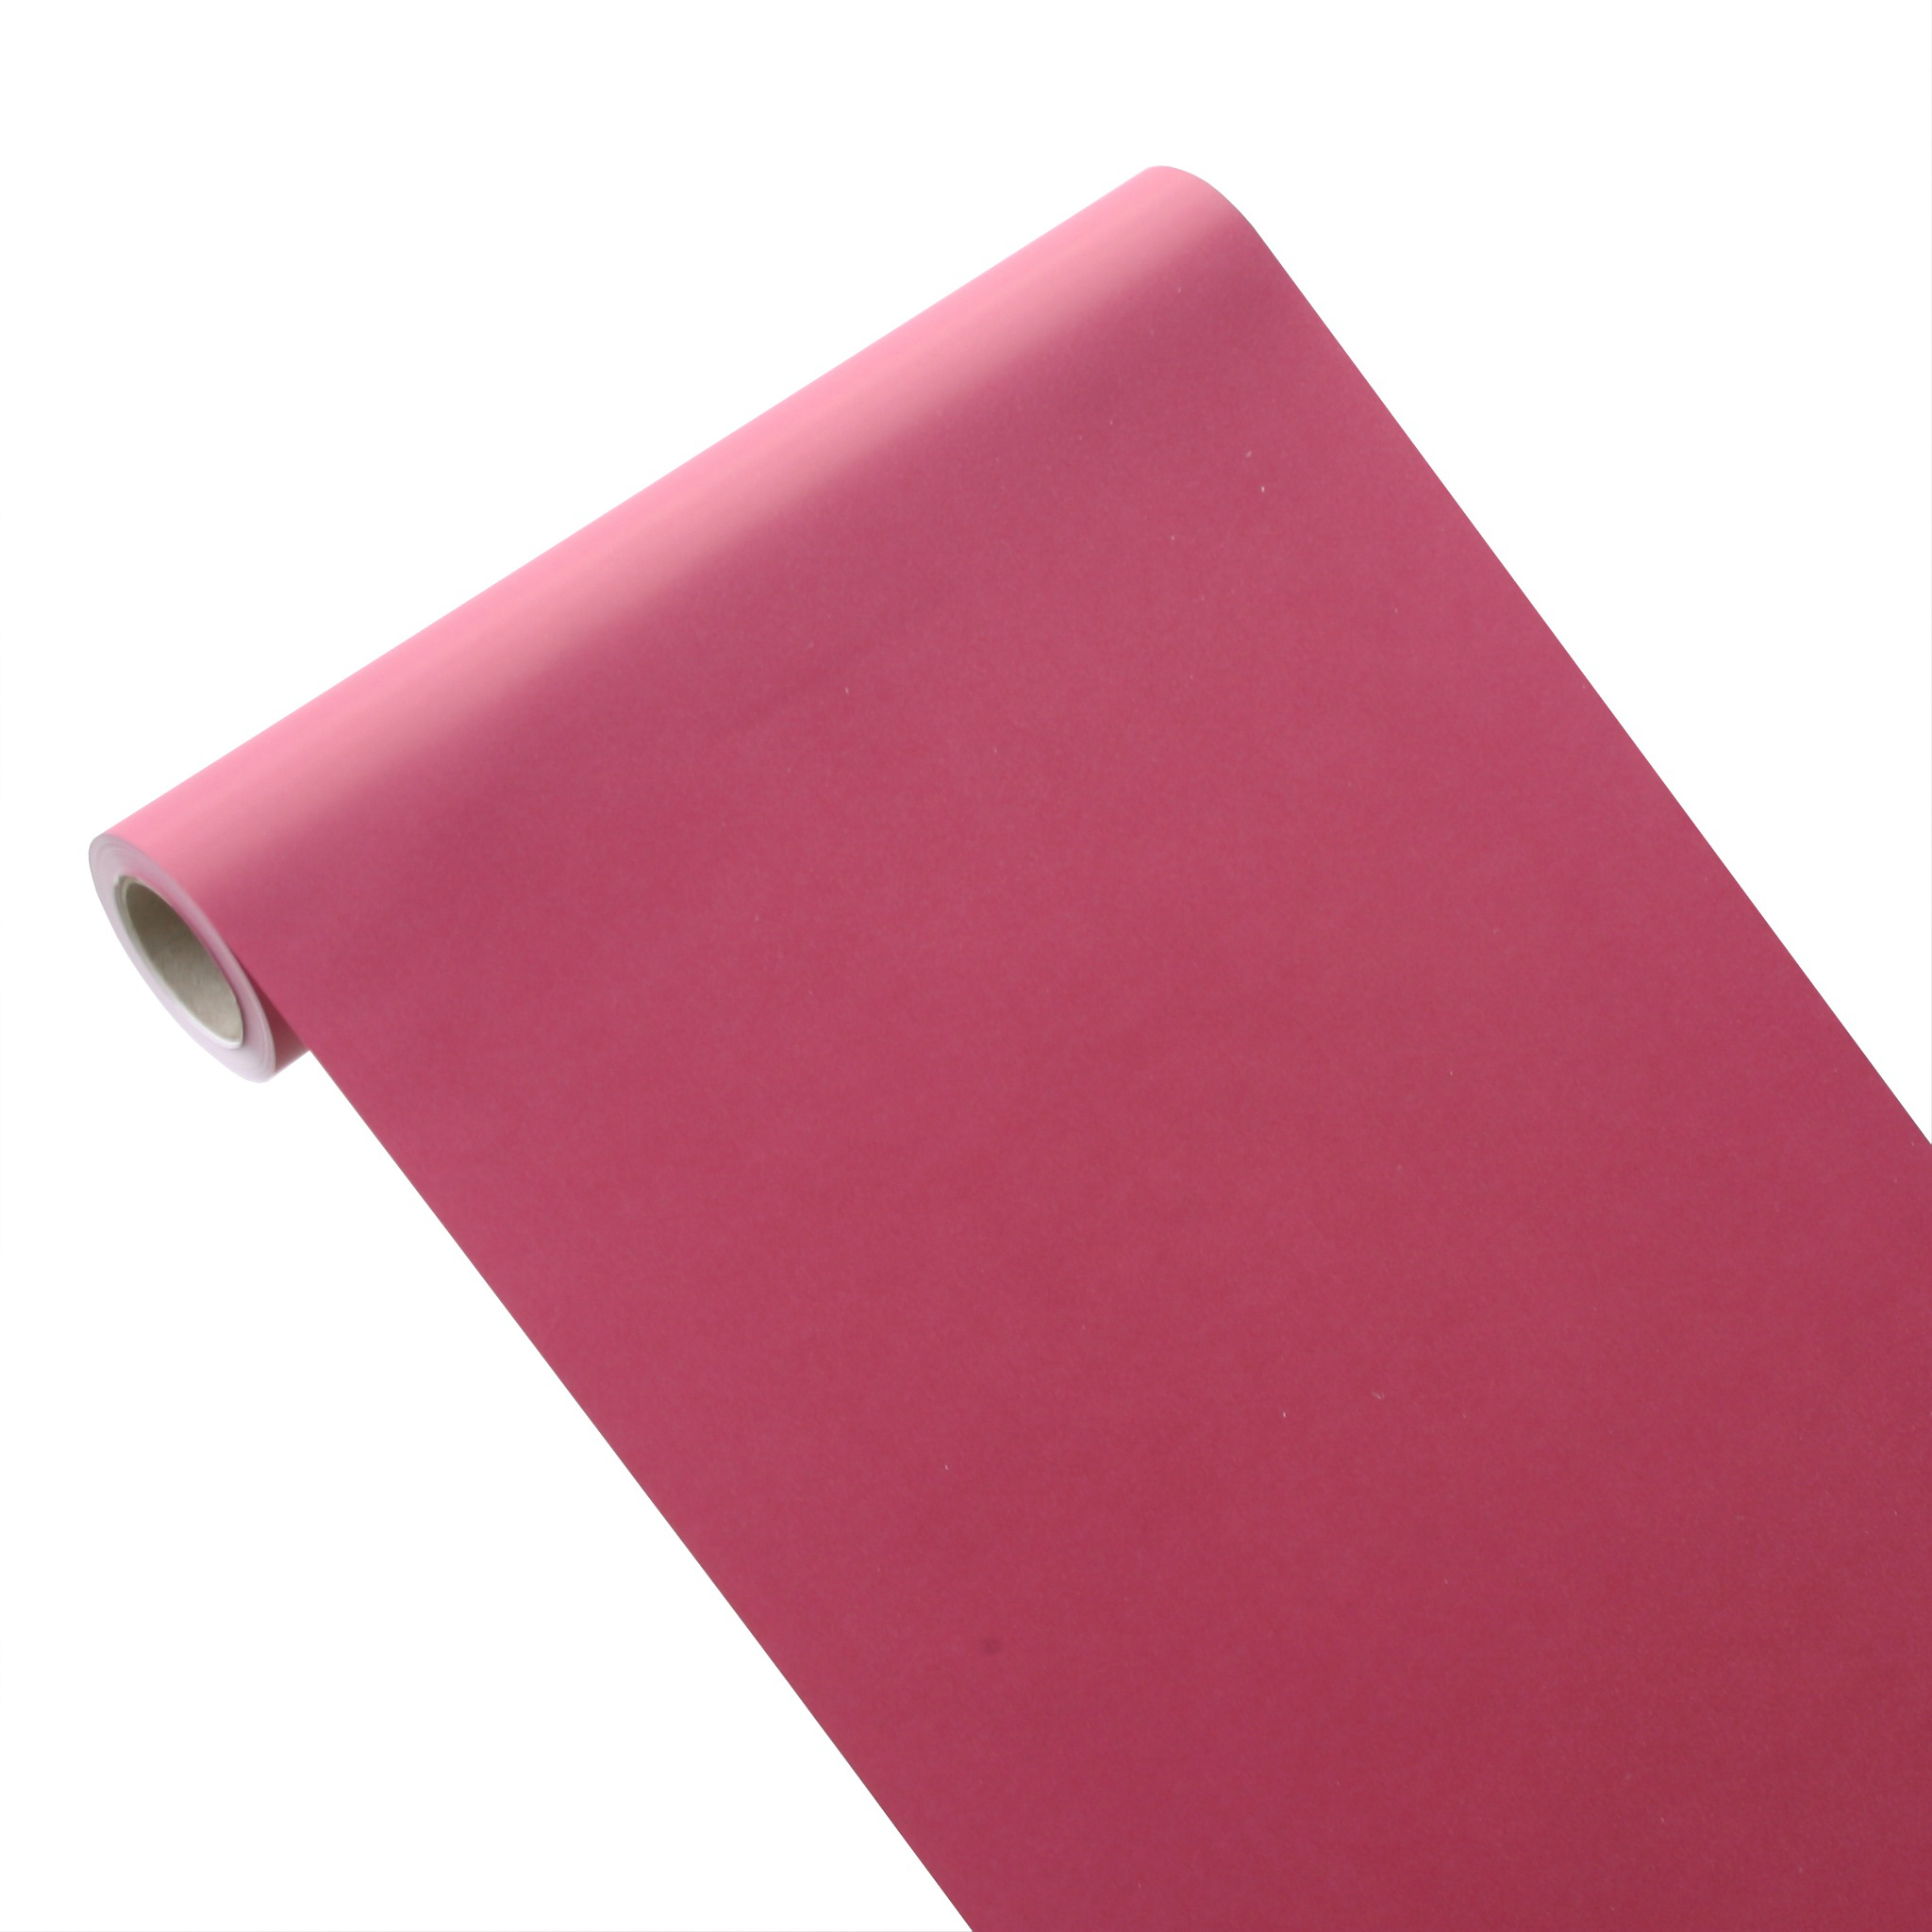 50m*0,40m JUNOPAX® Papier Tischläufer bordeaux-rot